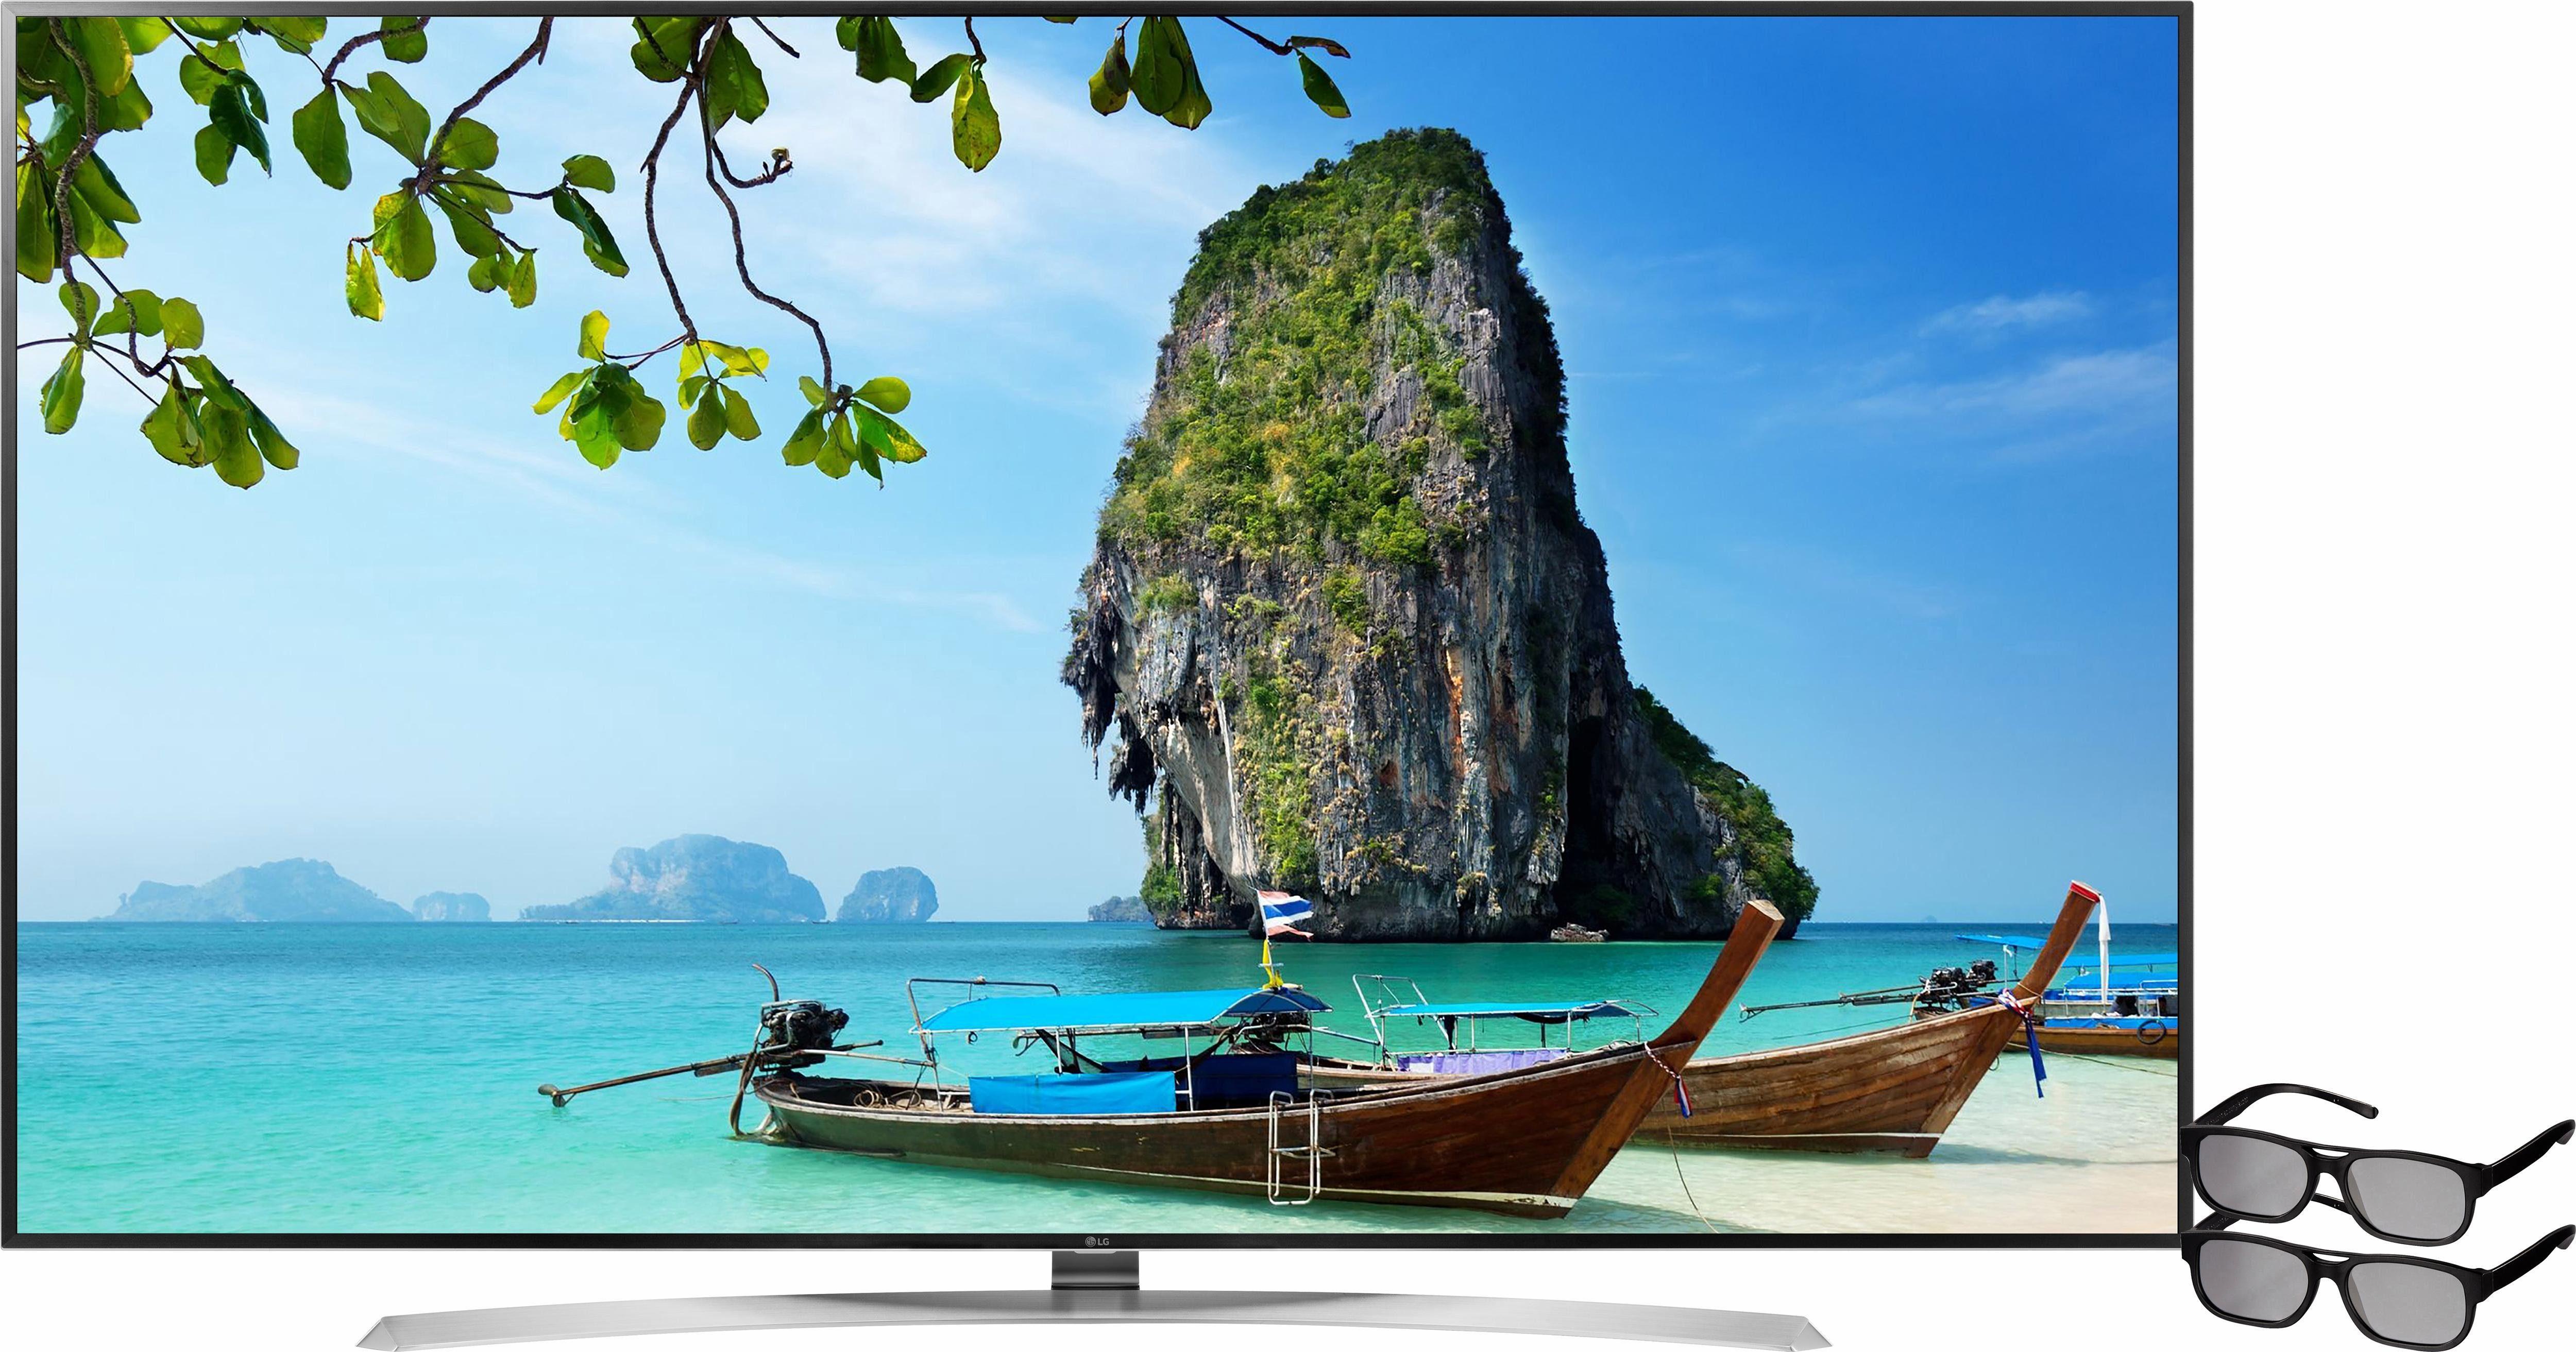 LG 86UH955V, LED Fernseher, 218 cm (86 Zoll), 2160p (4K Ultra HD), Smart-TV